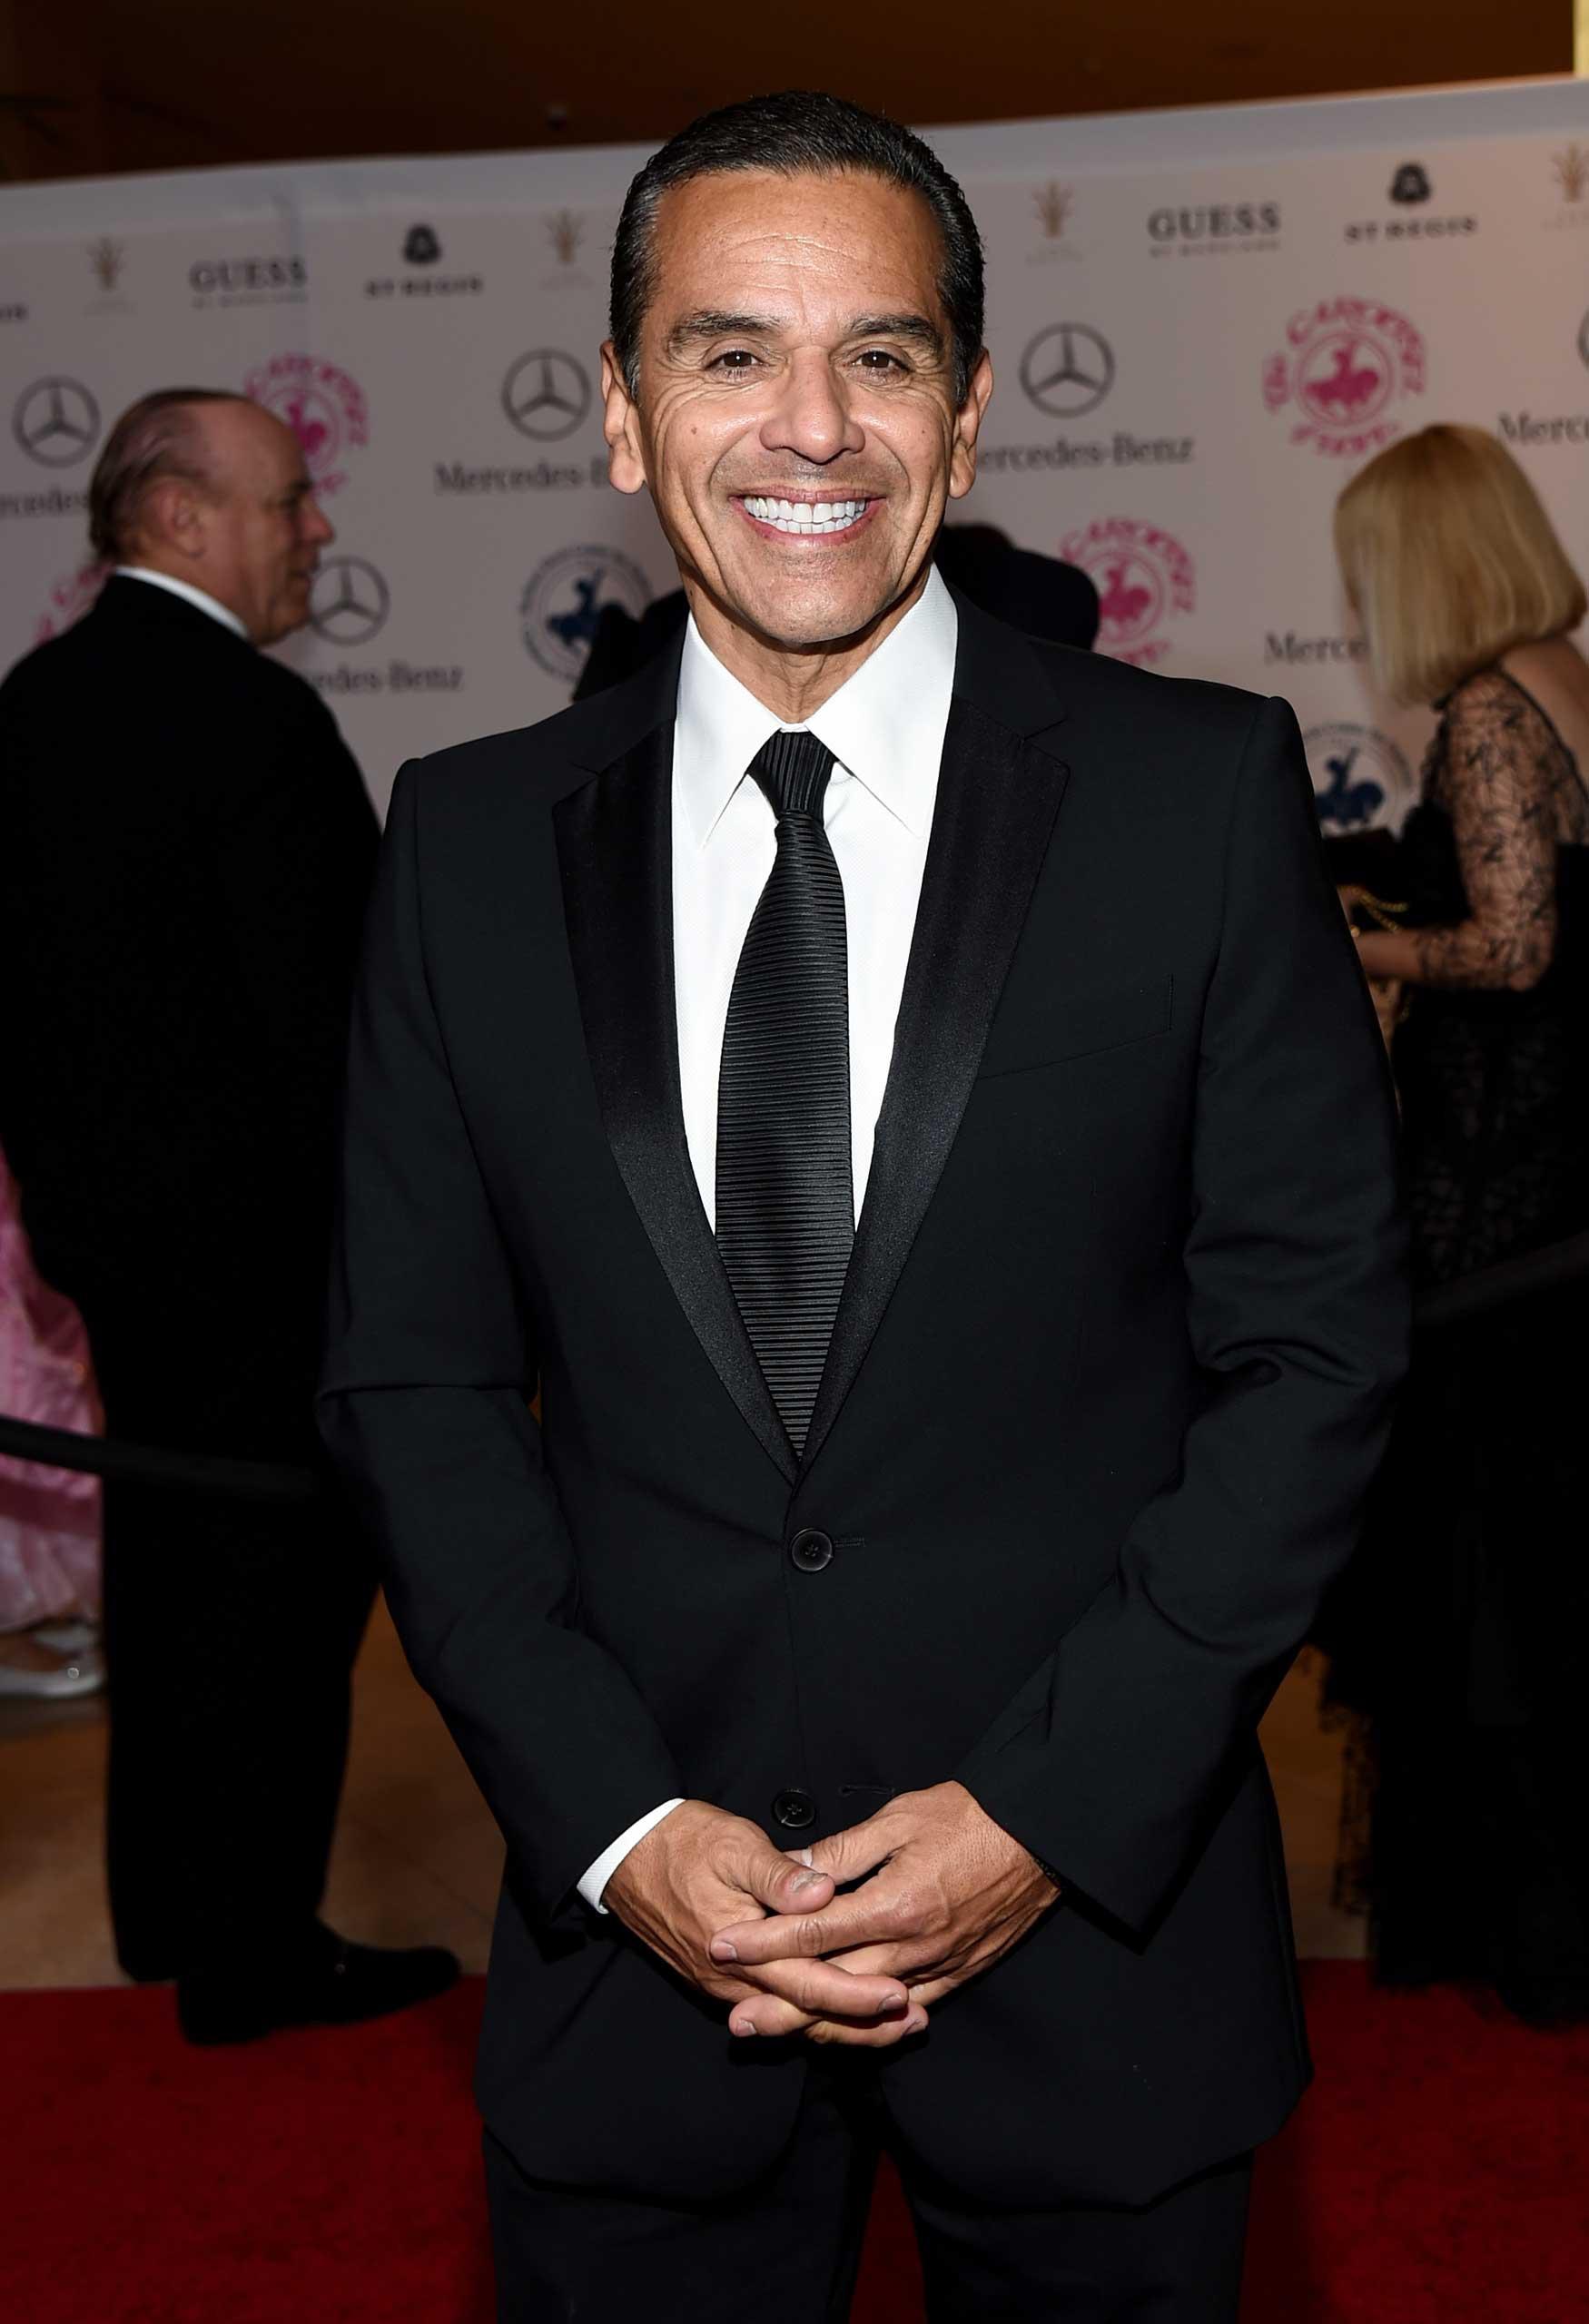 Antonio Villaraigosa was the mayor of Los Angeles before Garcetti, serving from 2005 to 2013.